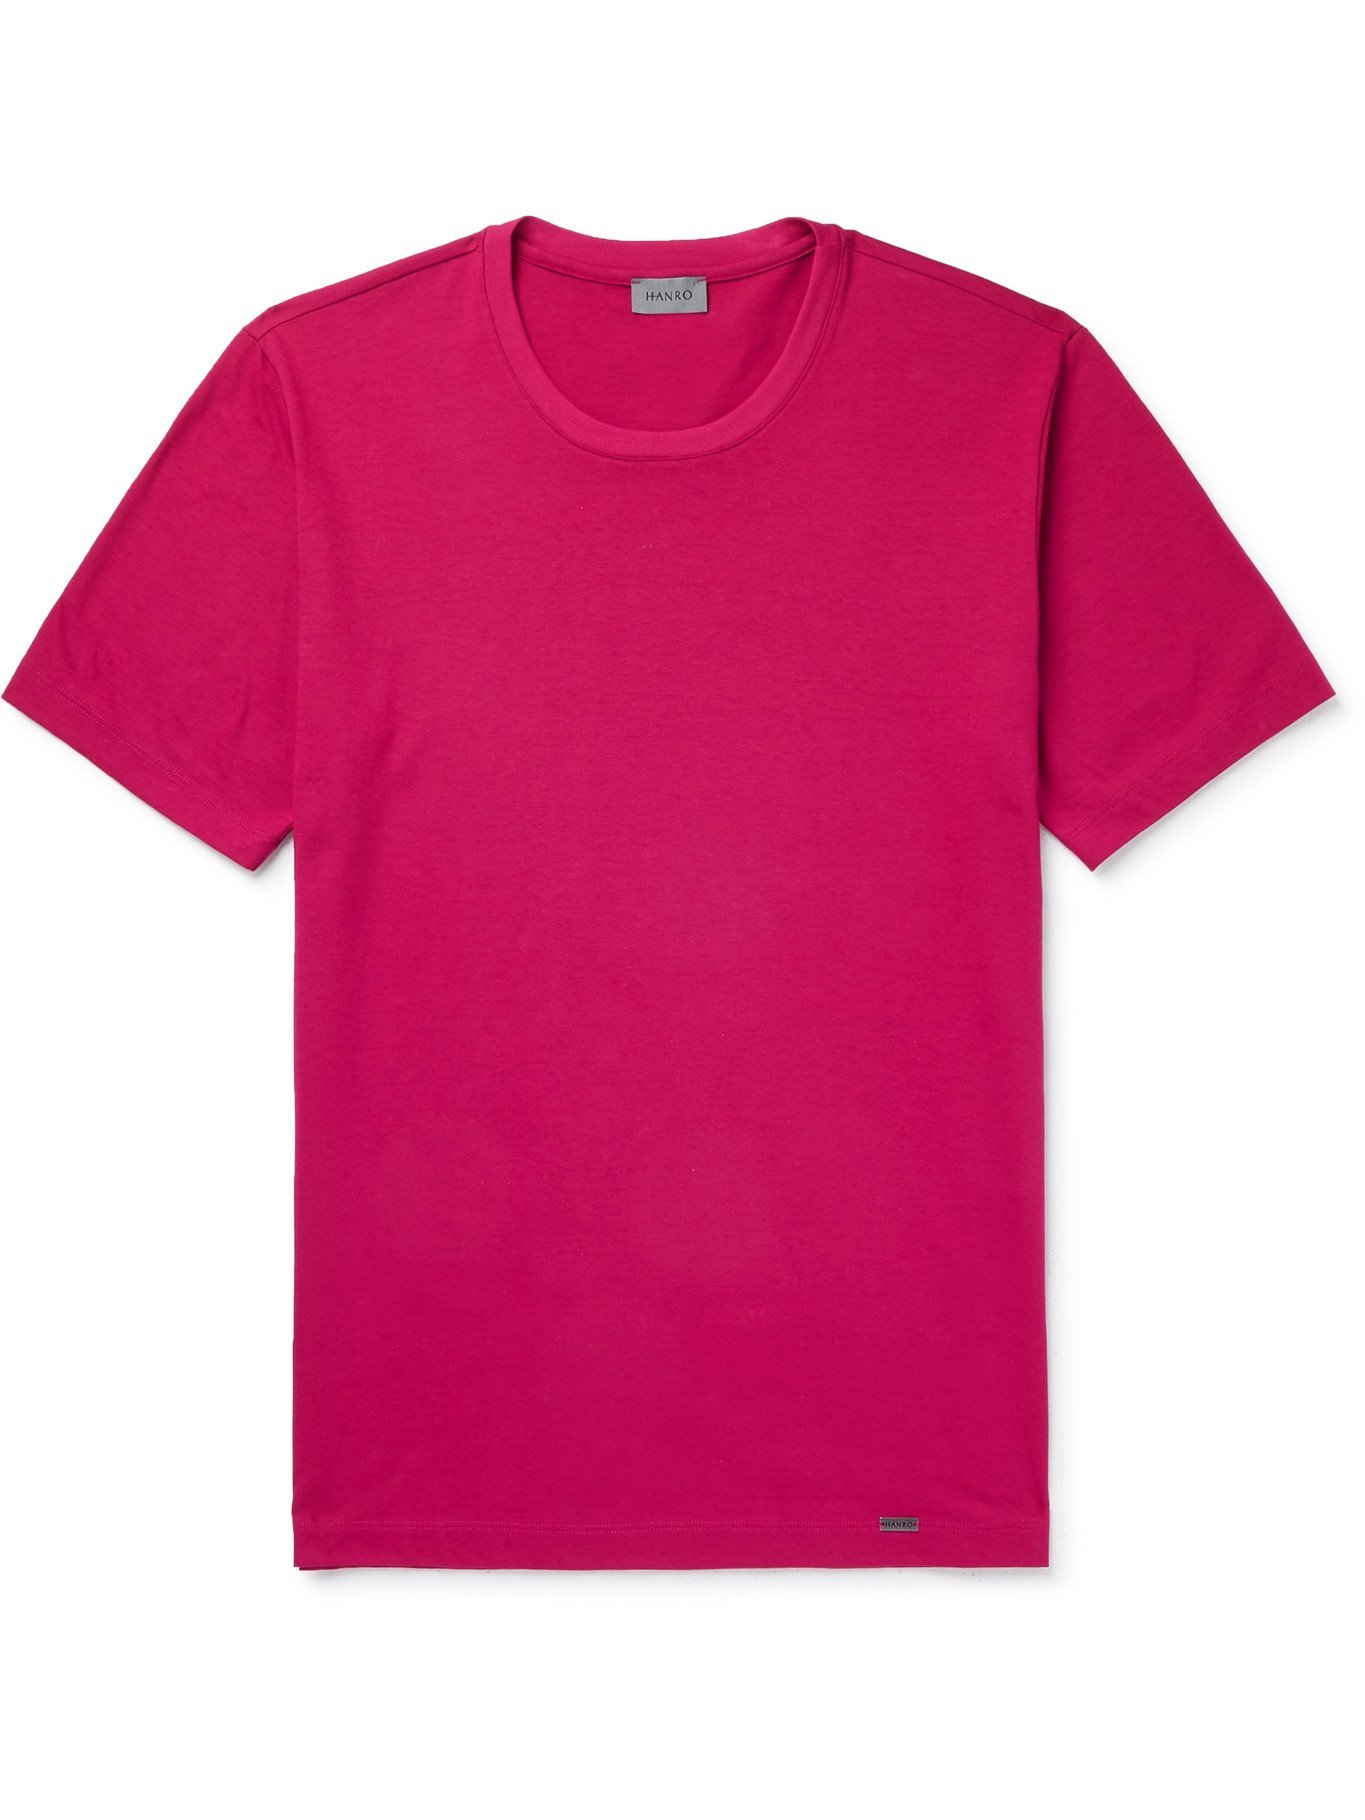 HANRO - Kurzman Cotton-Jersey T-shirt - Red